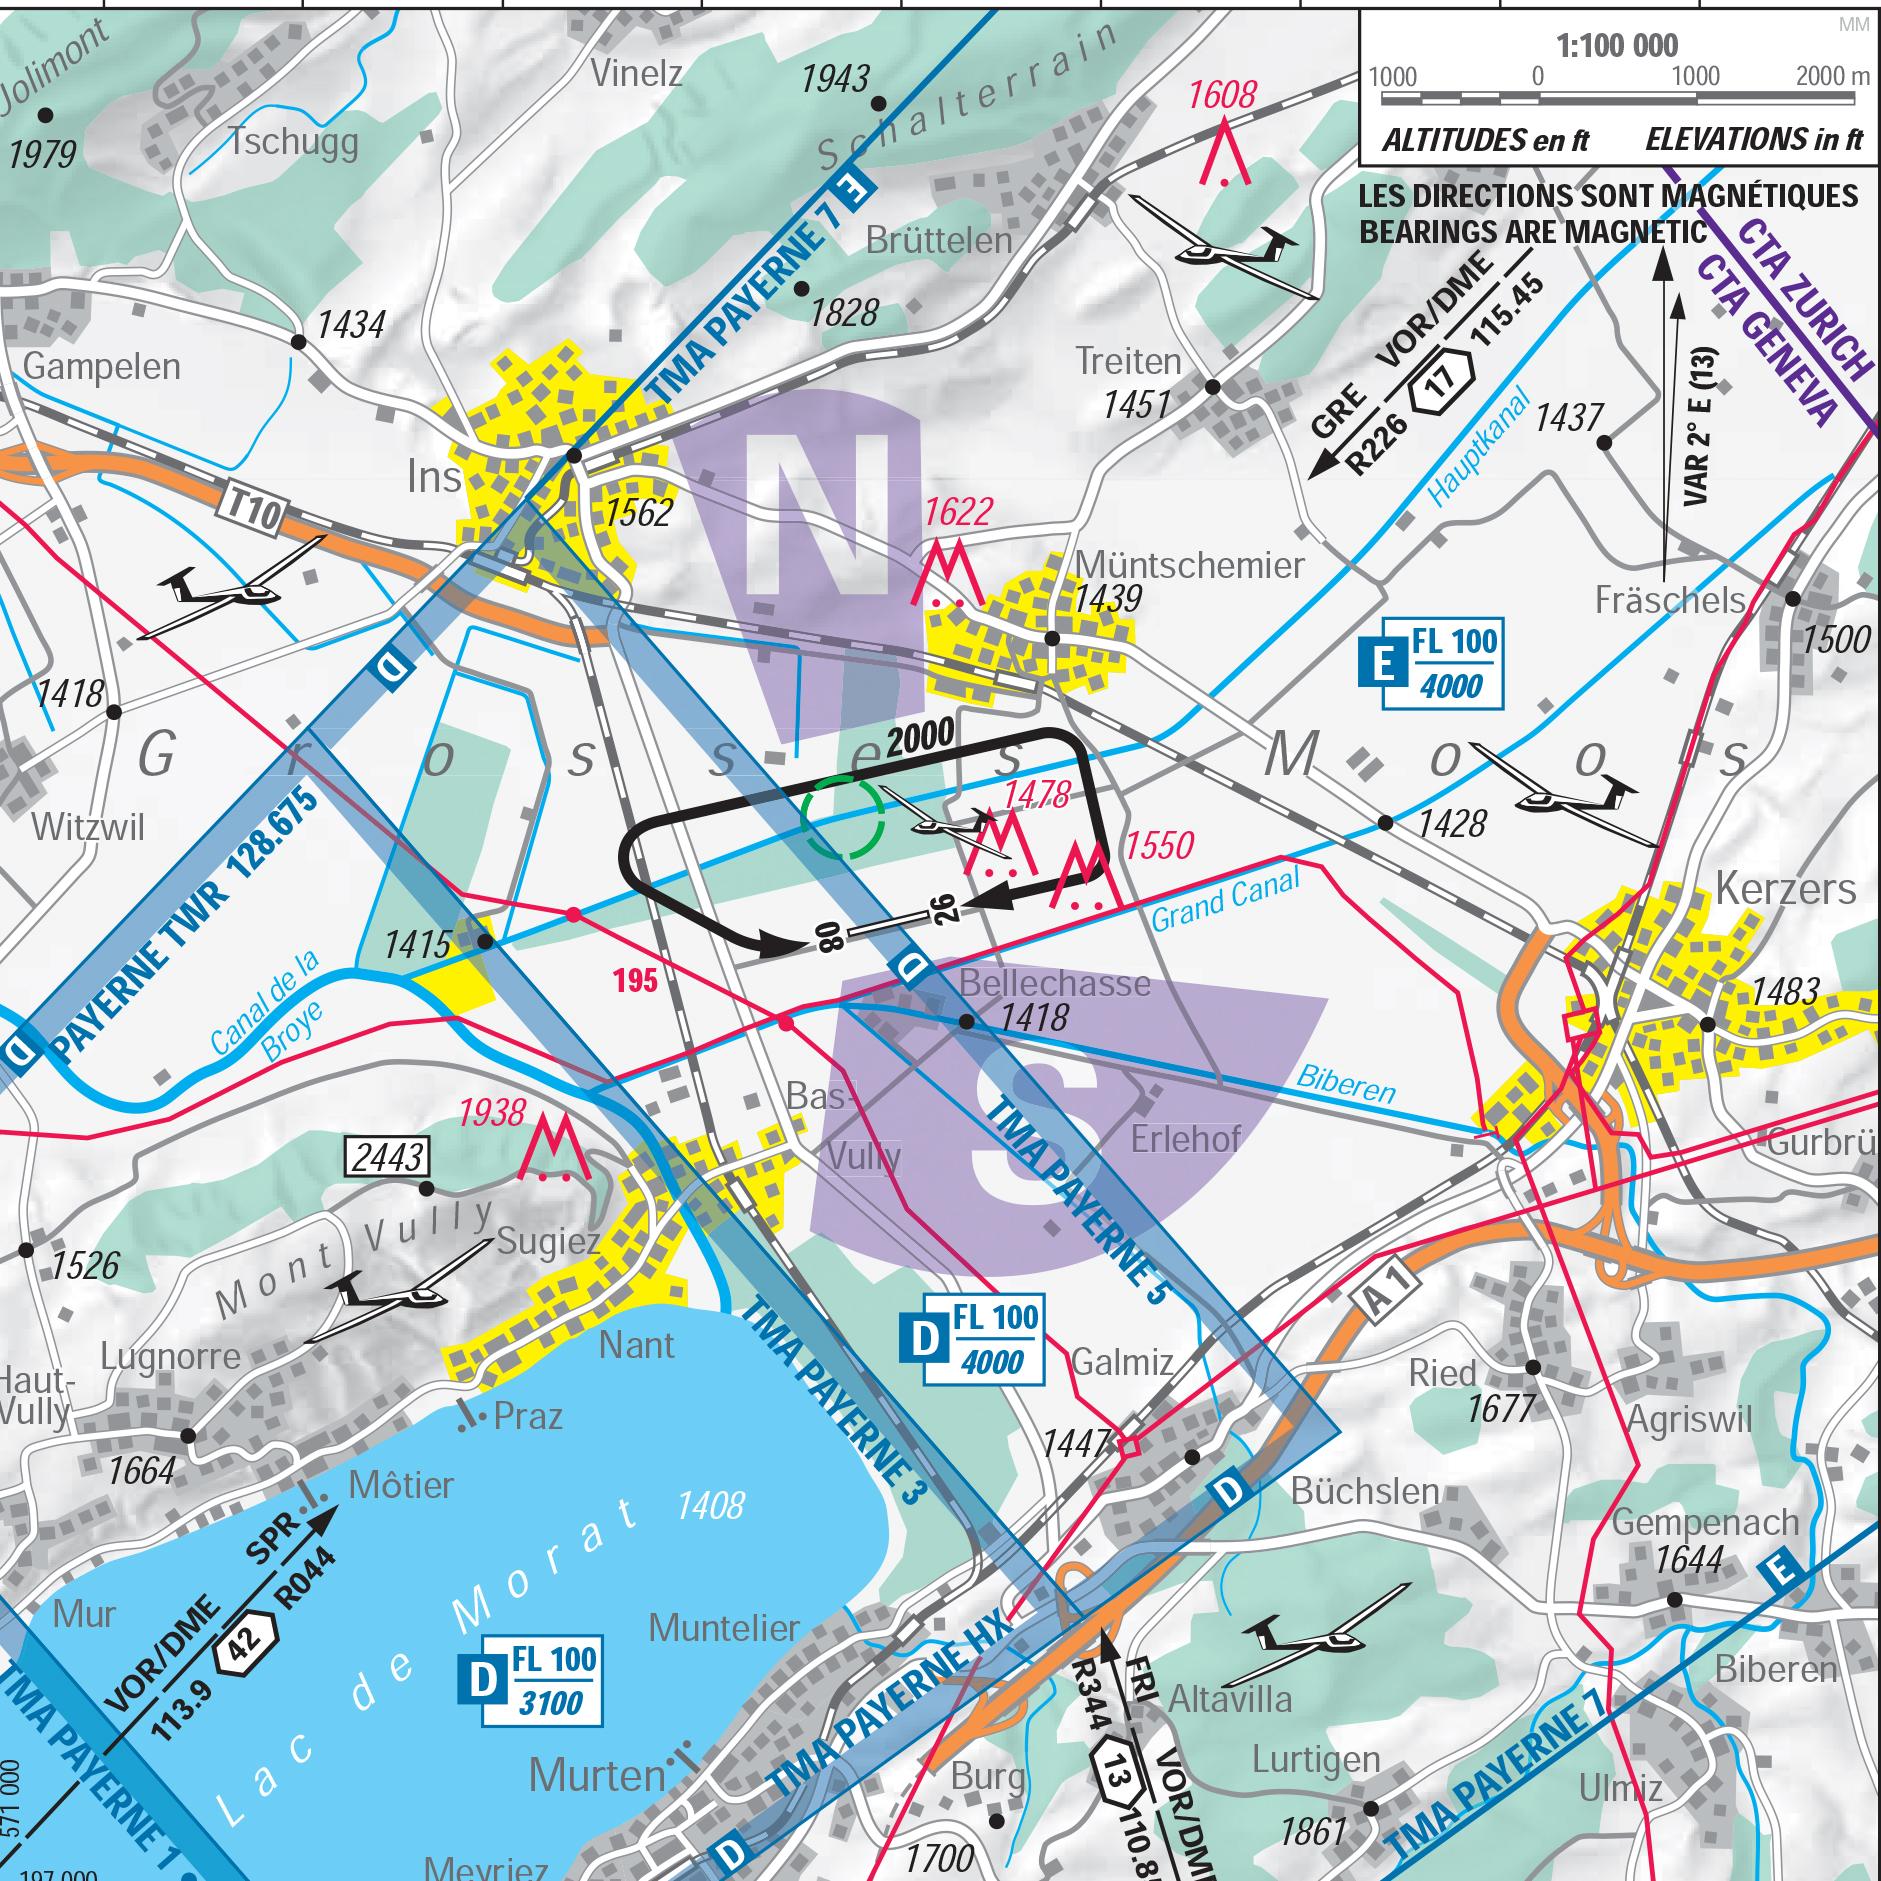 Not for navigational use Quelle: Bundesamt für Landestopografie swisstopo, skyguide